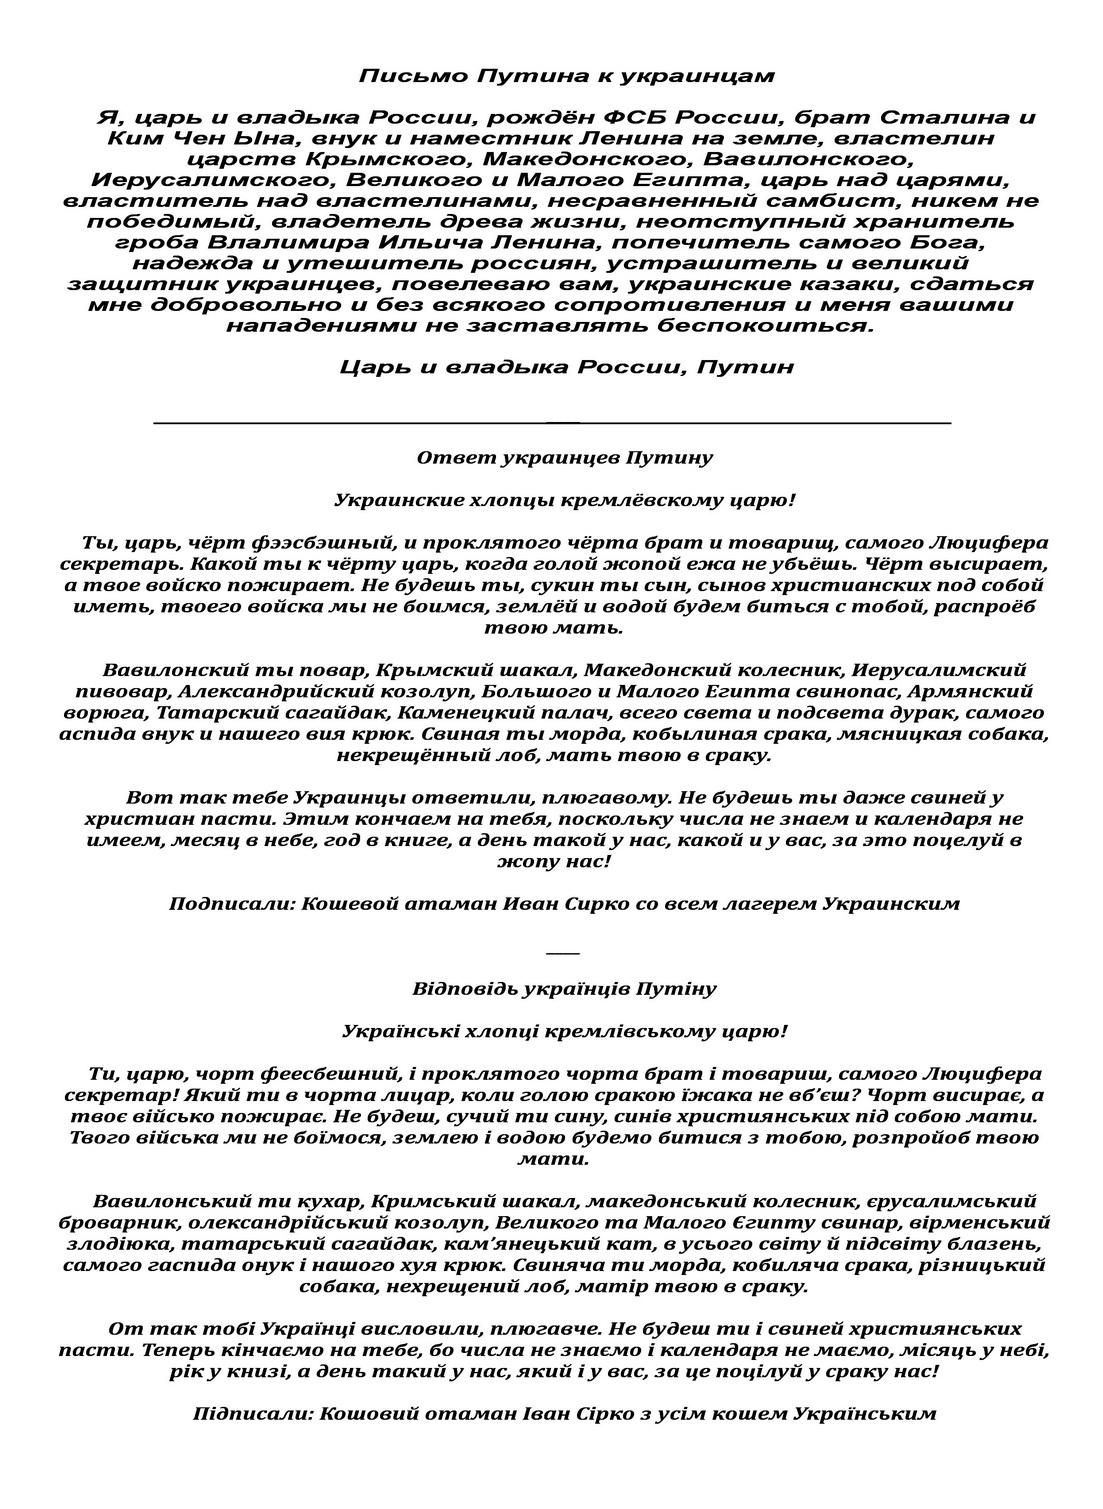 http://img-fotki.yandex.ru/get/9262/219038366.0/0_d22e1_b591ef14_orig